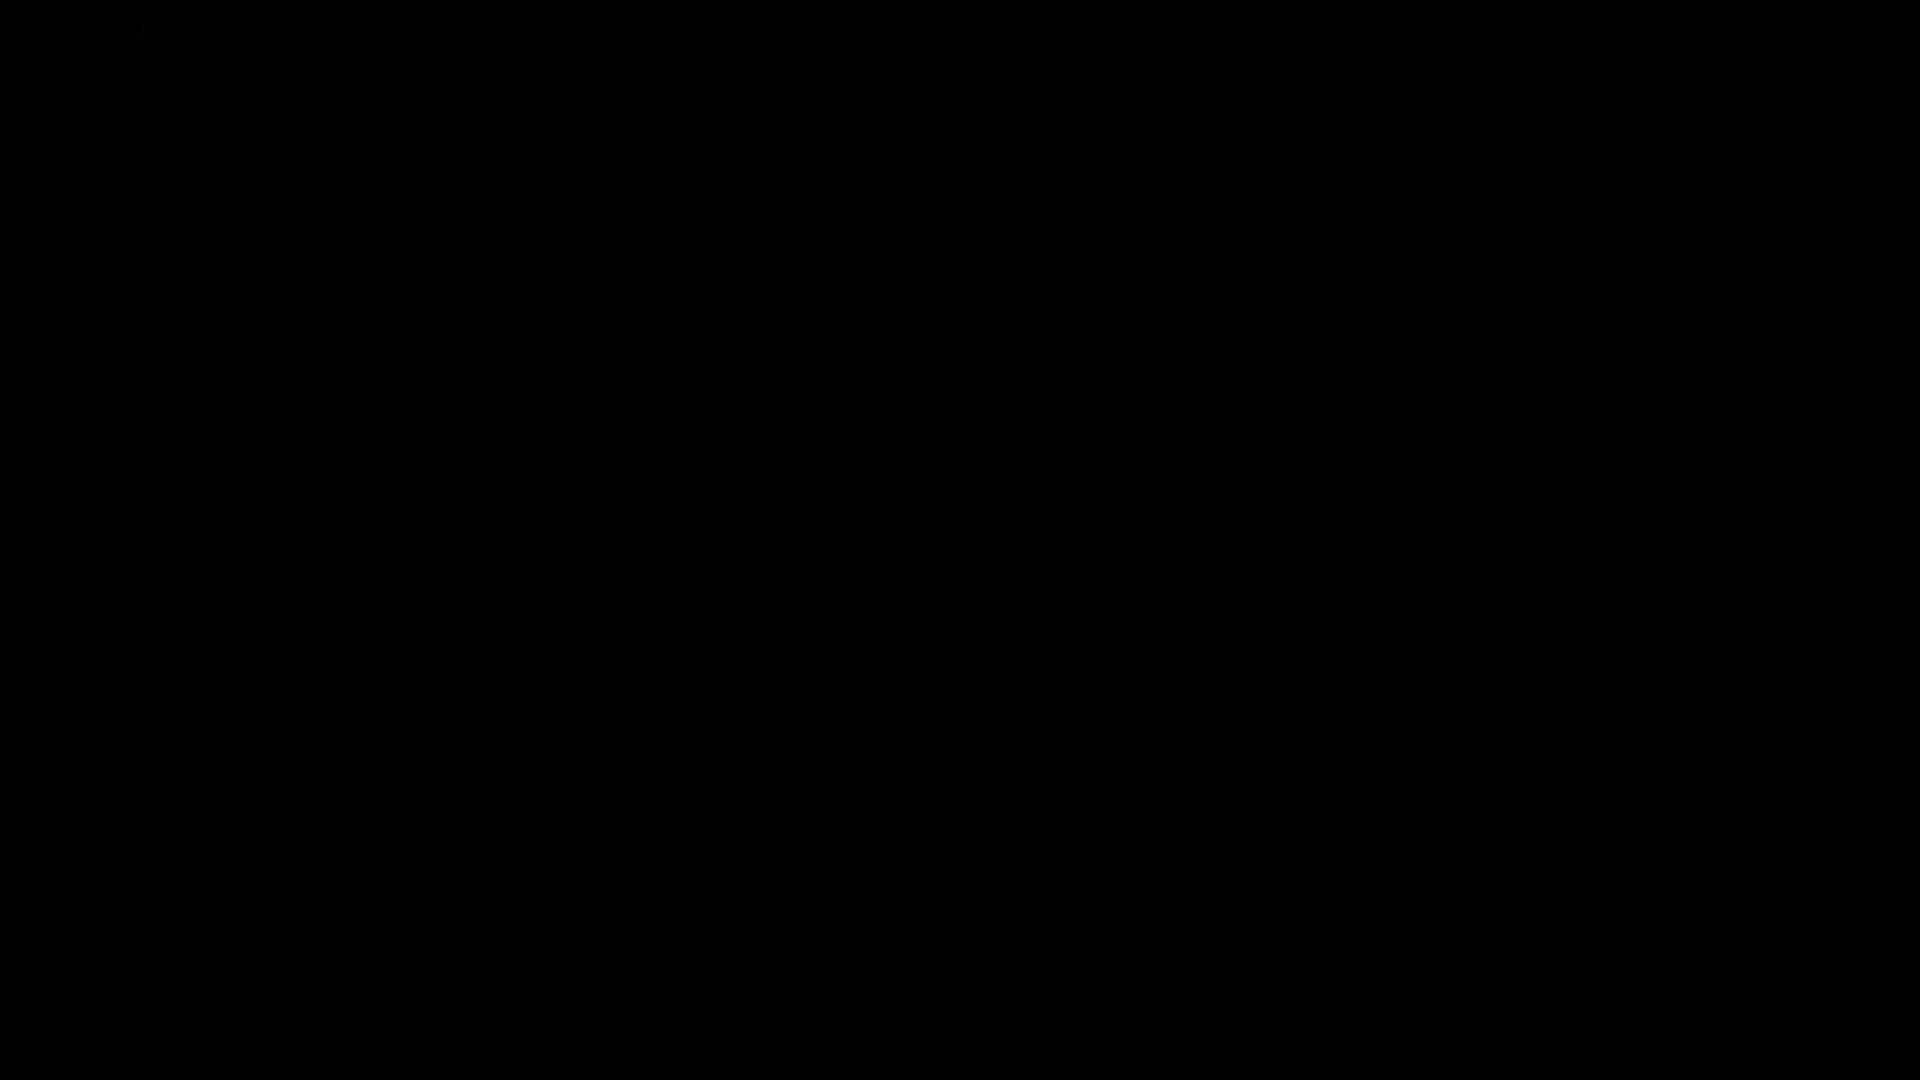 JD盗撮 美女の洗面所の秘密 Vol.10 トイレのぞき ワレメ無修正動画無料 78画像 39